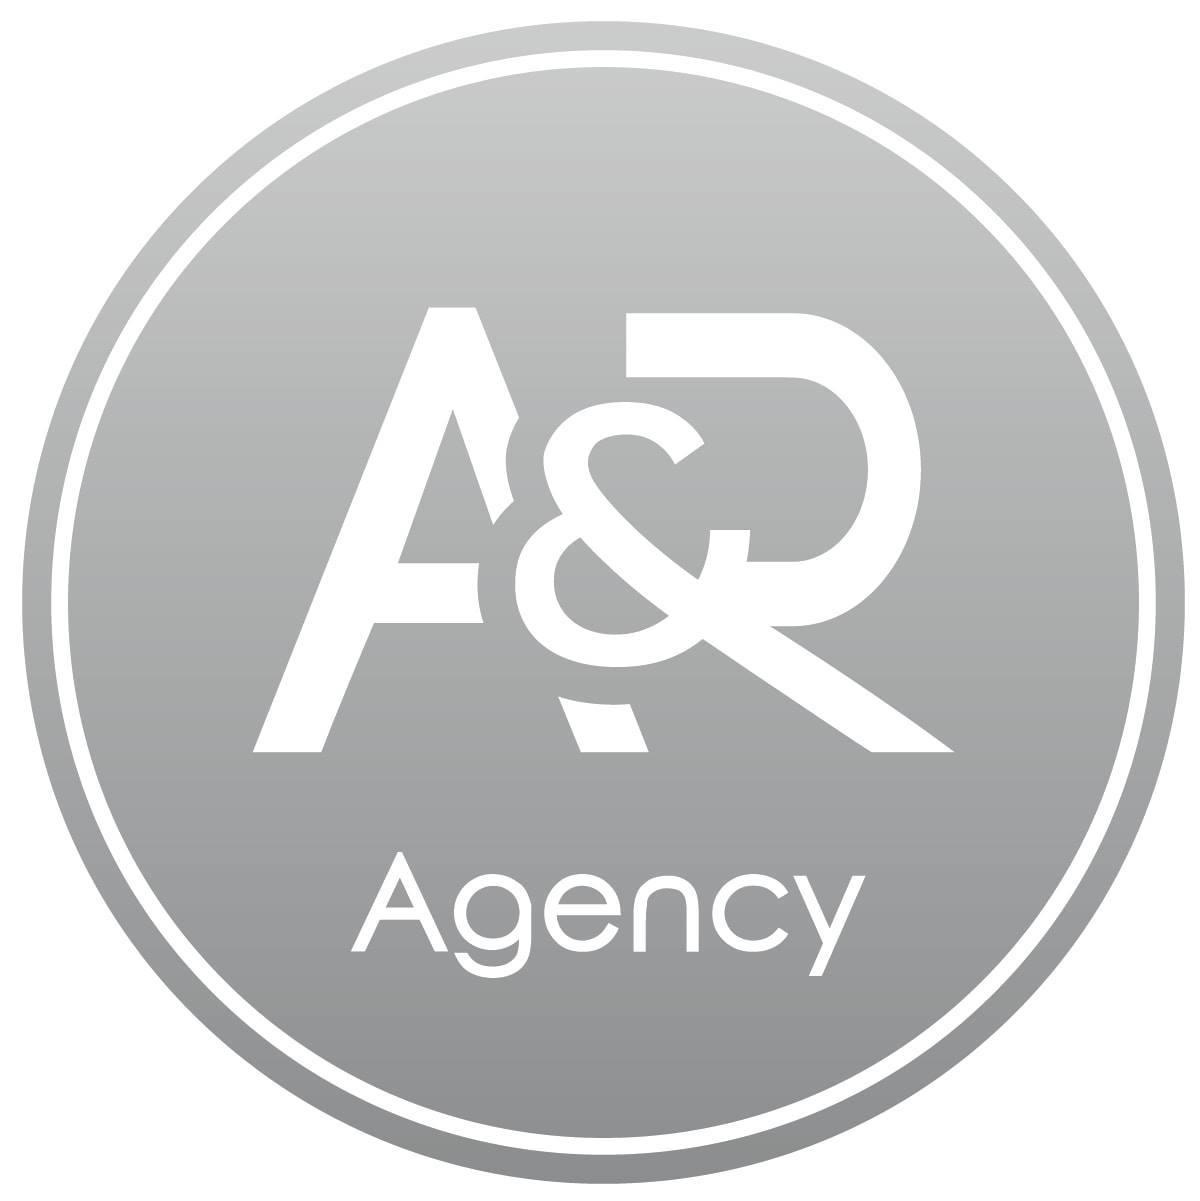 TheANRAgency_logo.jpg